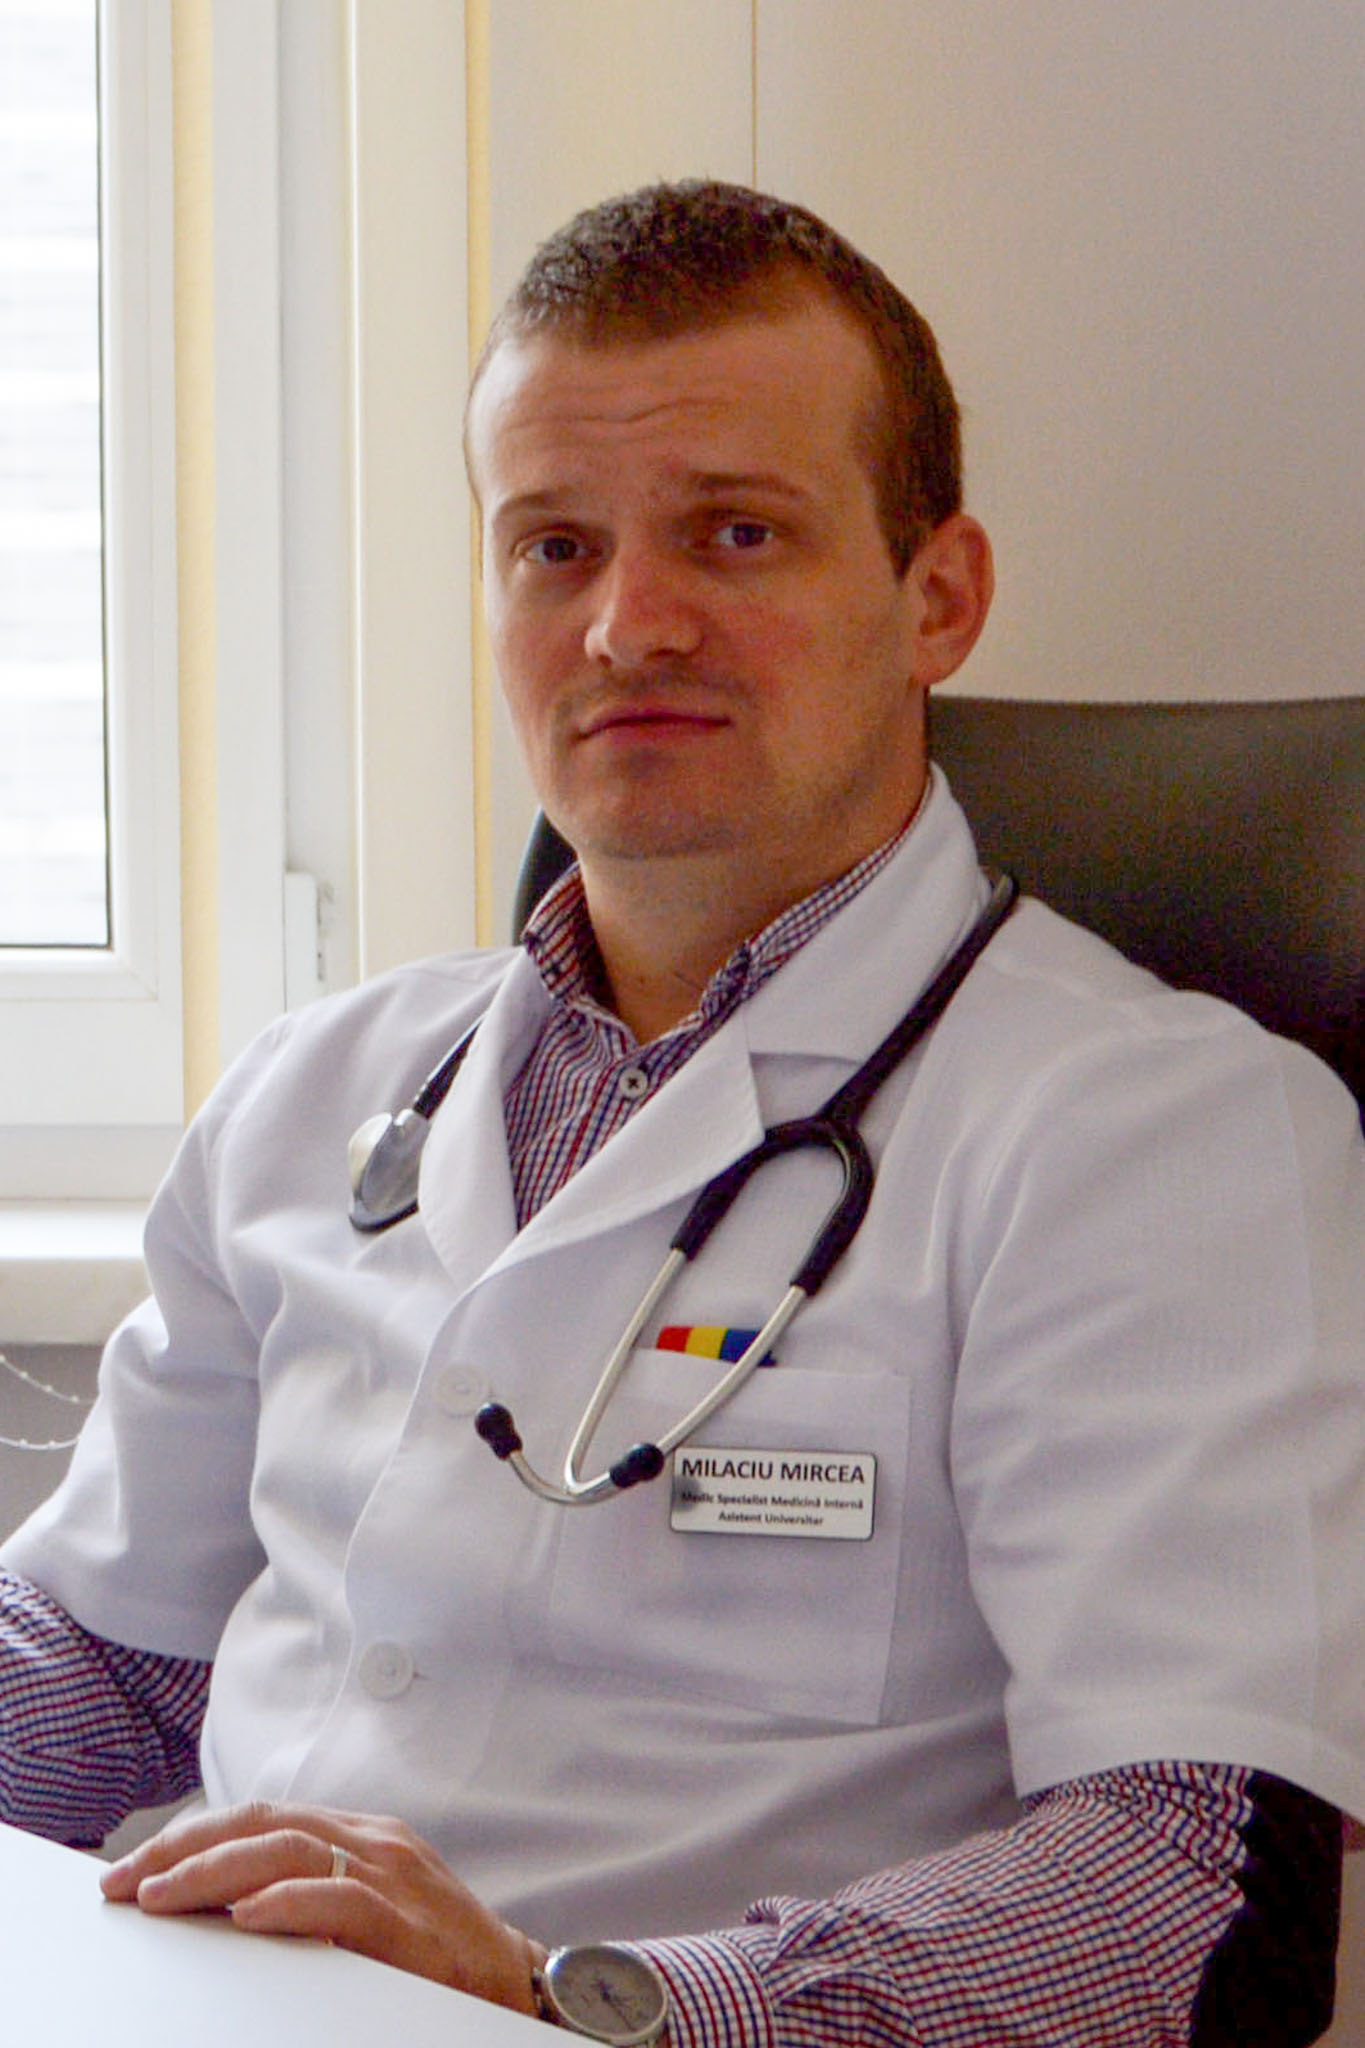 Dr. Mircea Milaciu